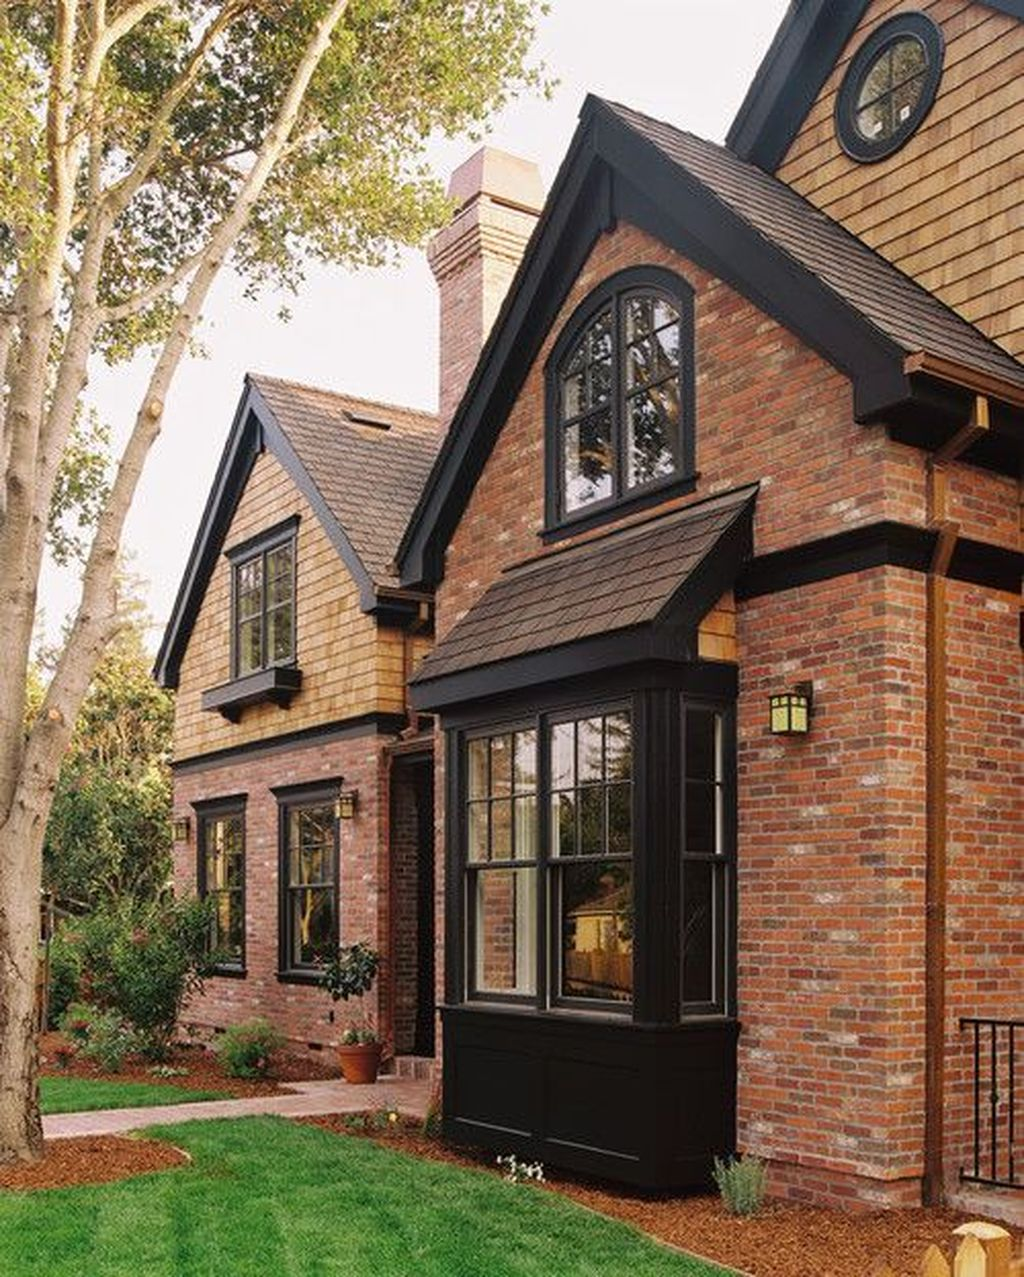 Impressive Brick House Exterior Design Ideas That You Definitely Like 10